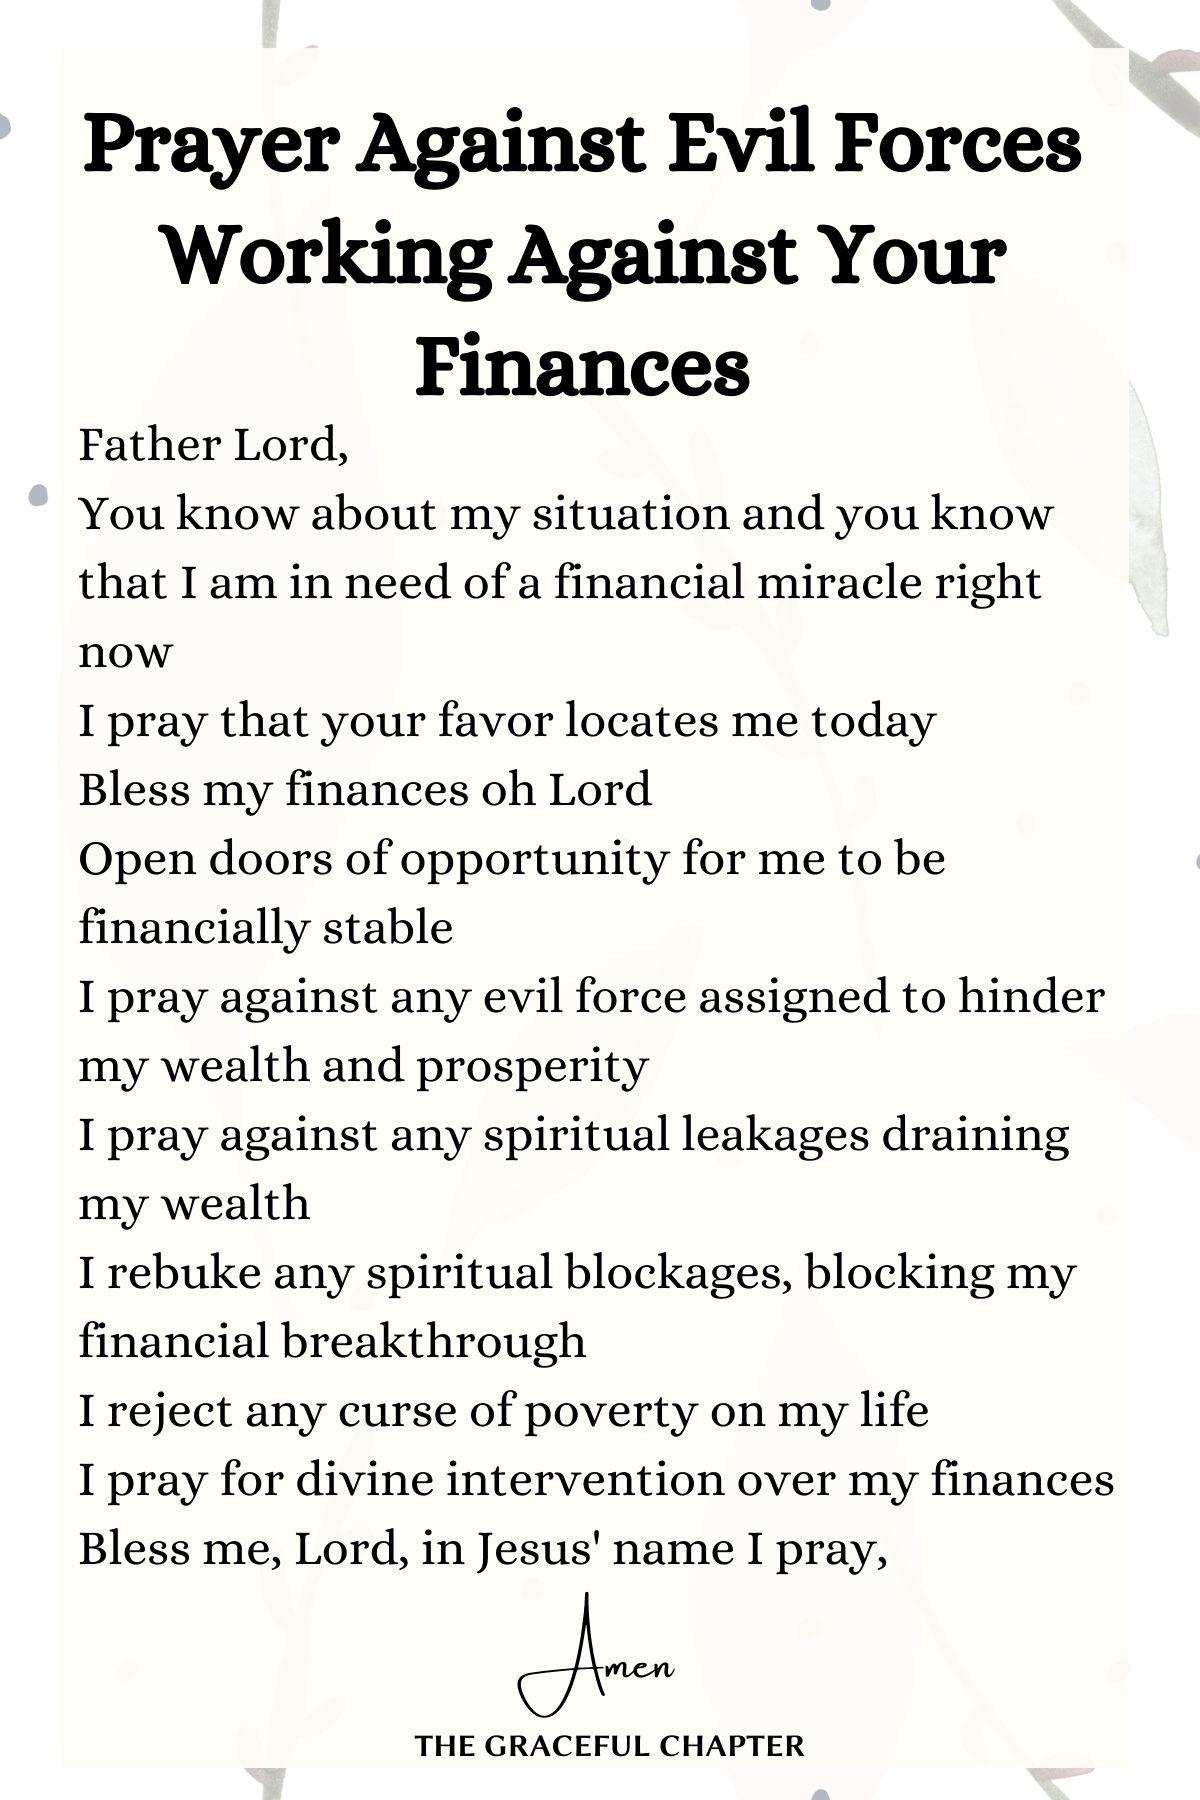 Prayer against evil forces working against your finances